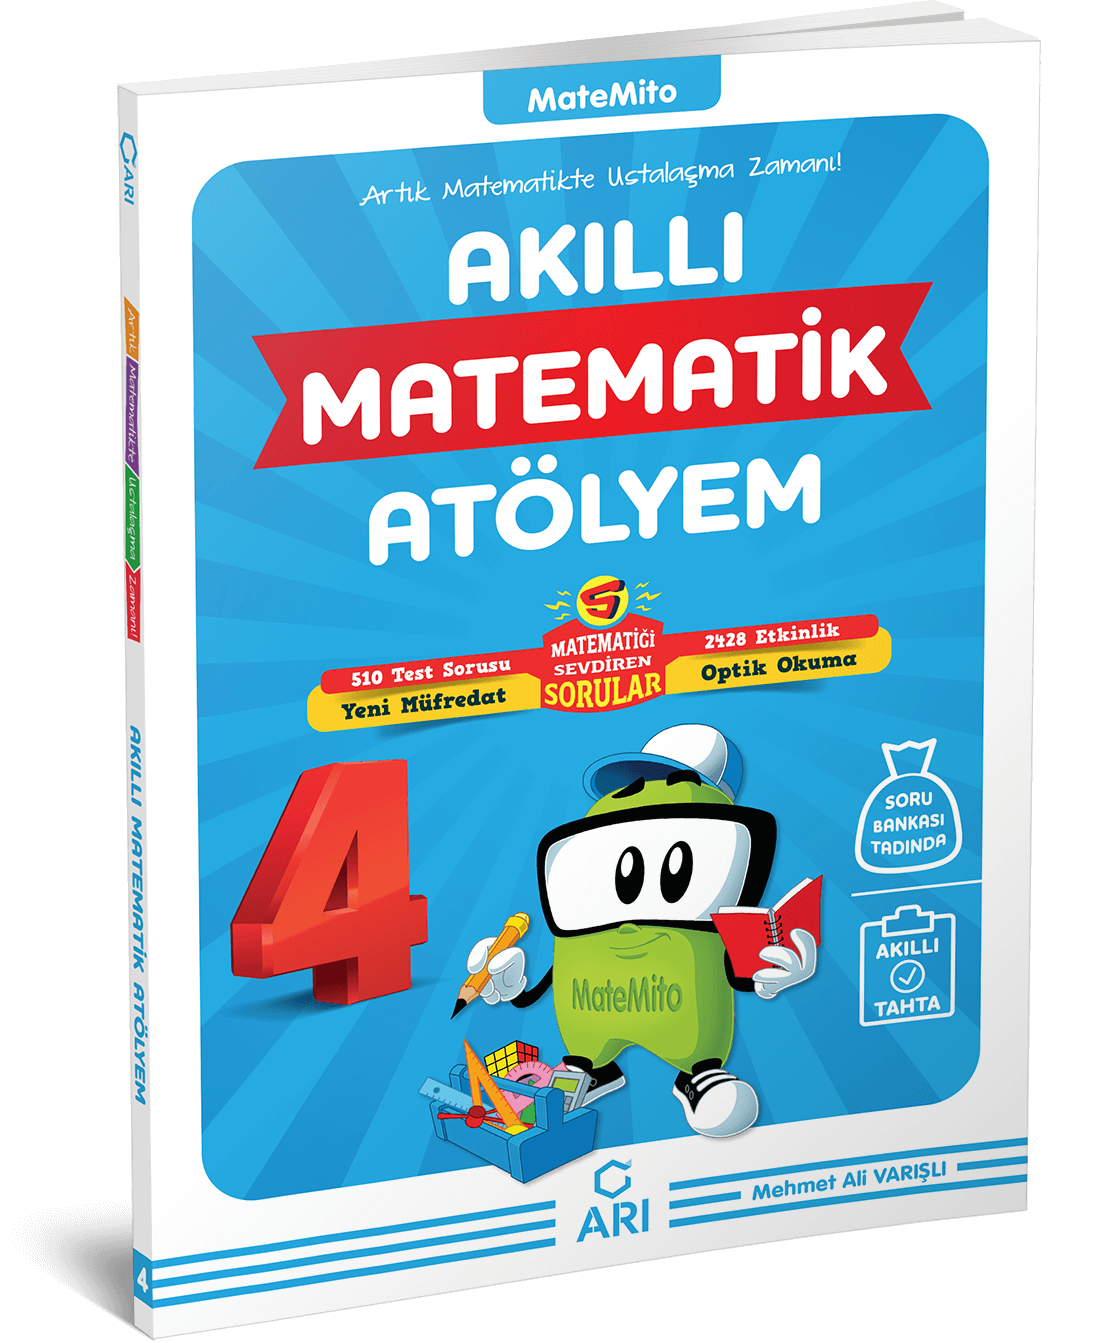 Matemito Akıllı Matematik Atölyem 4.Sınıf